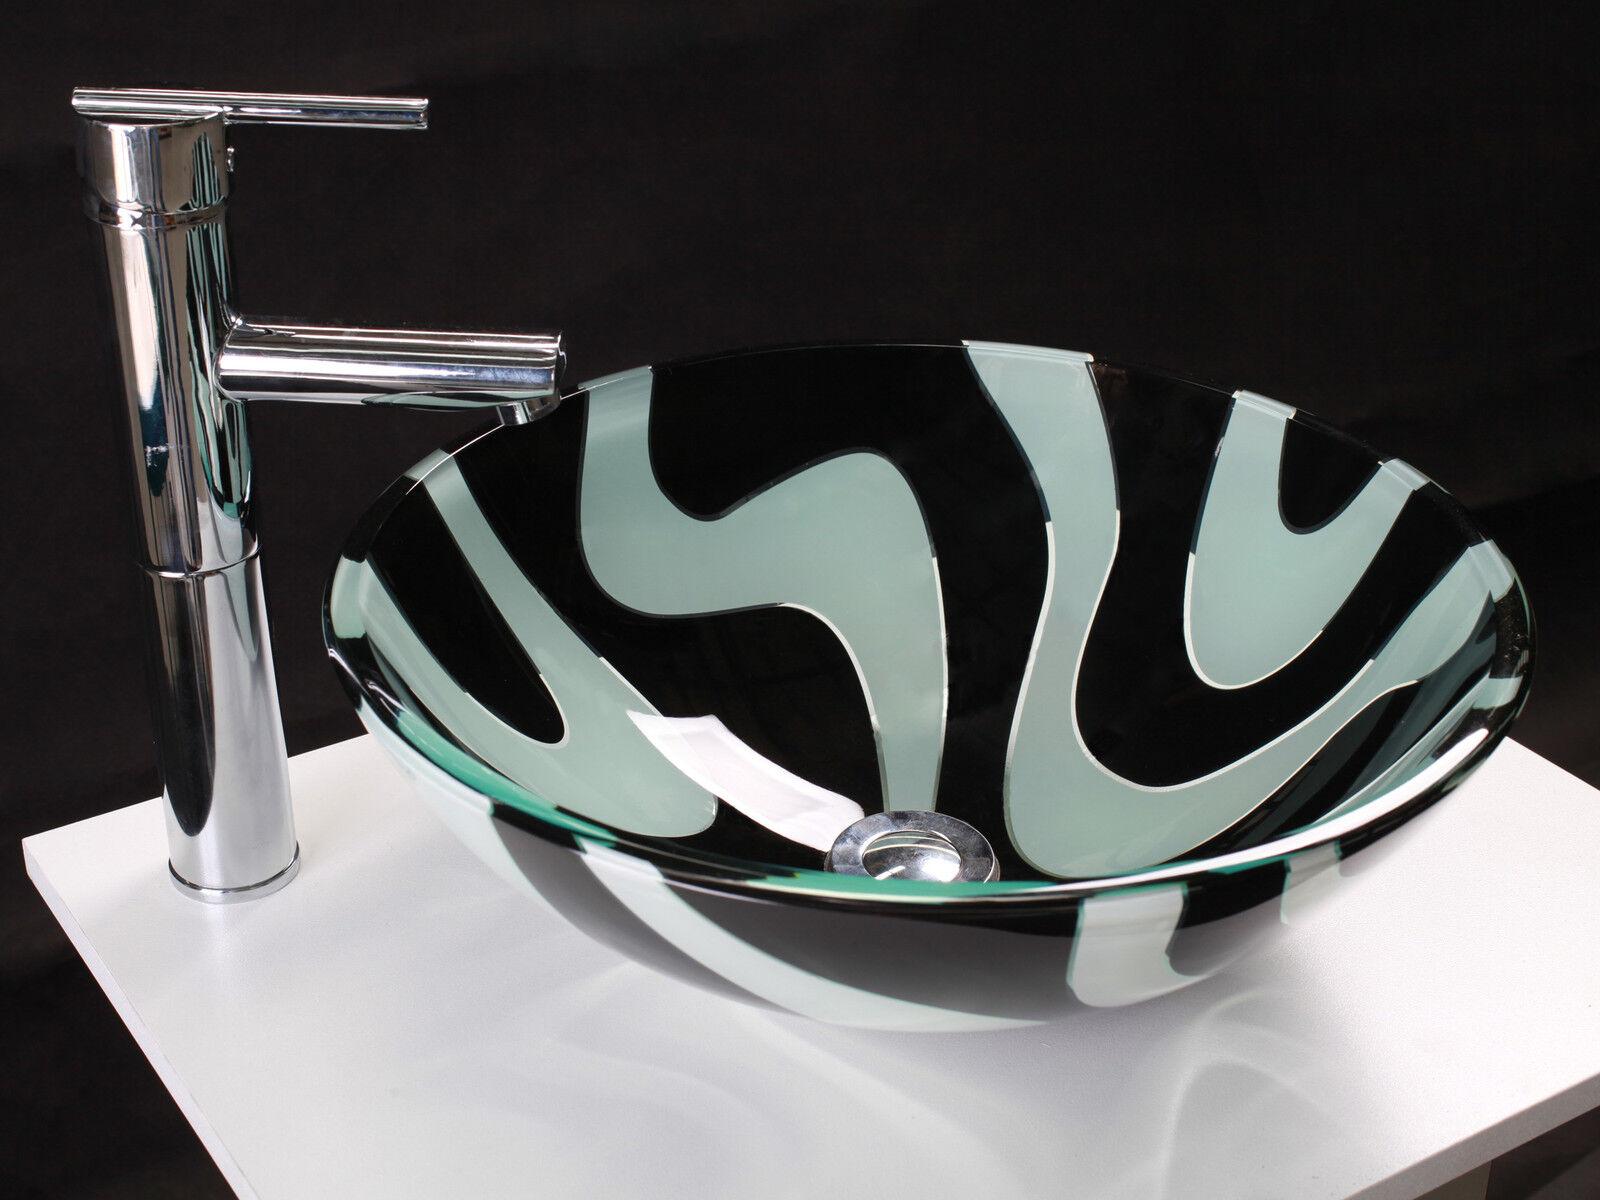 ZUS Accessories and Bathroom Ware